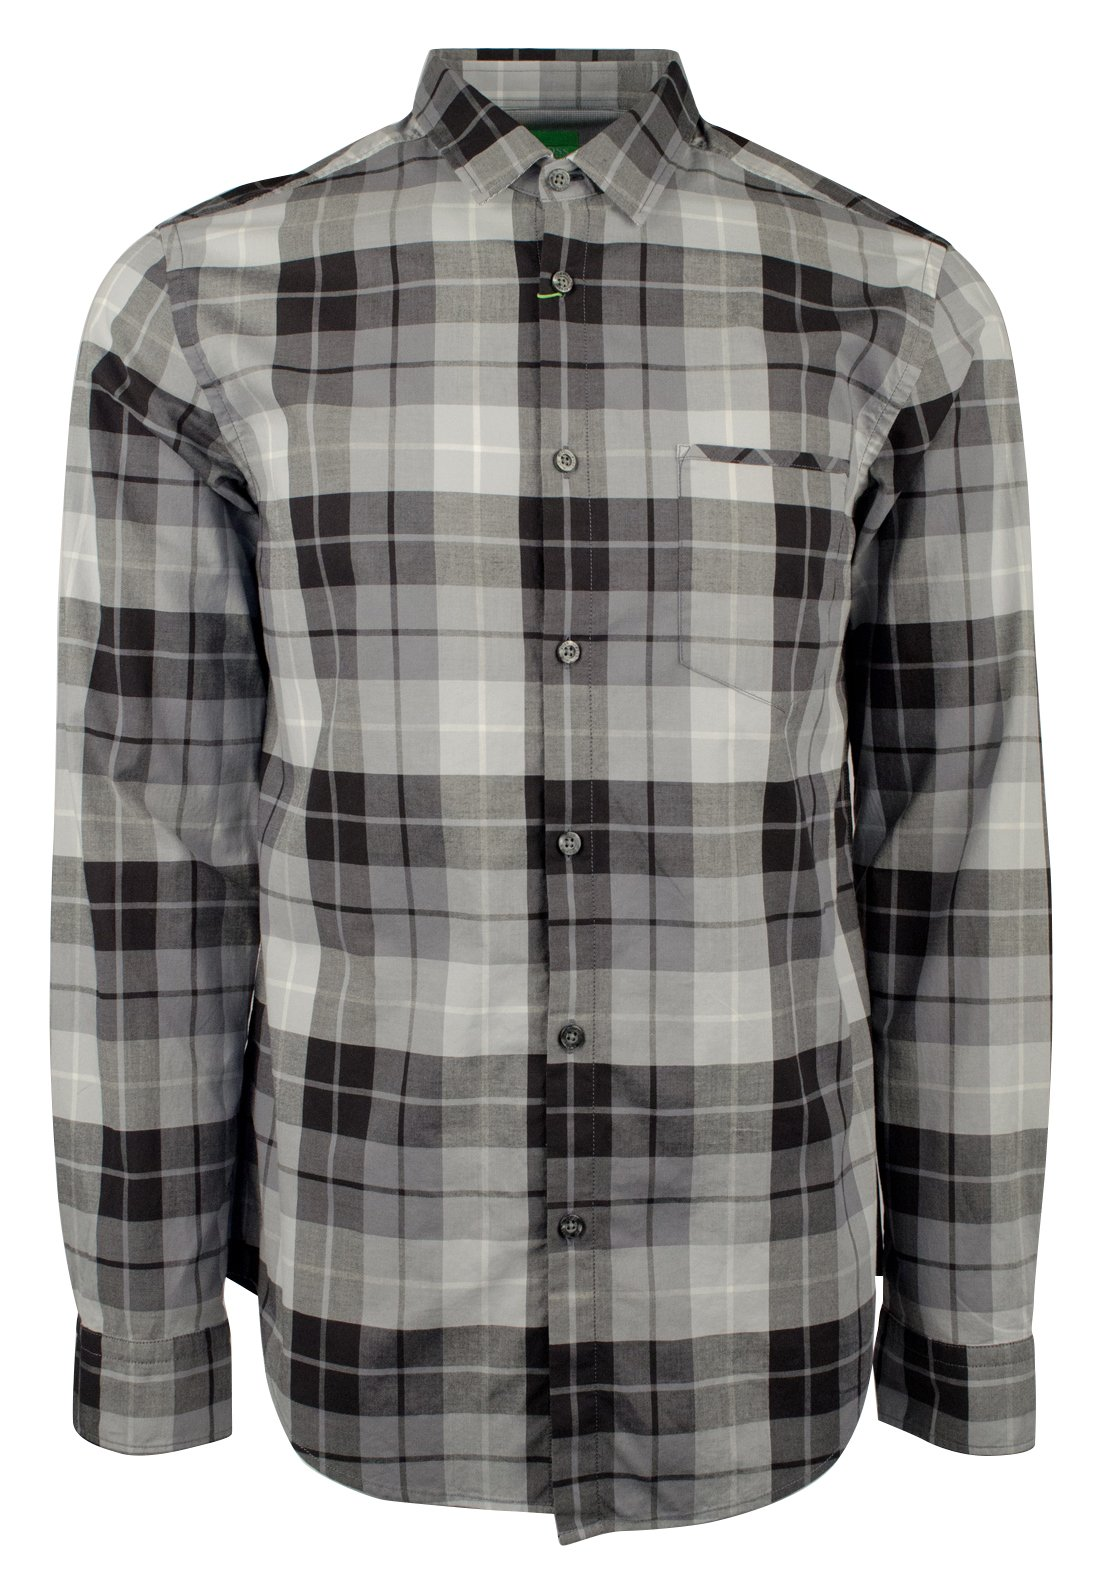 Hugo Boss Men's Green Label C-Bansi Regular Fit Plaid Dress Shirt-BG-S